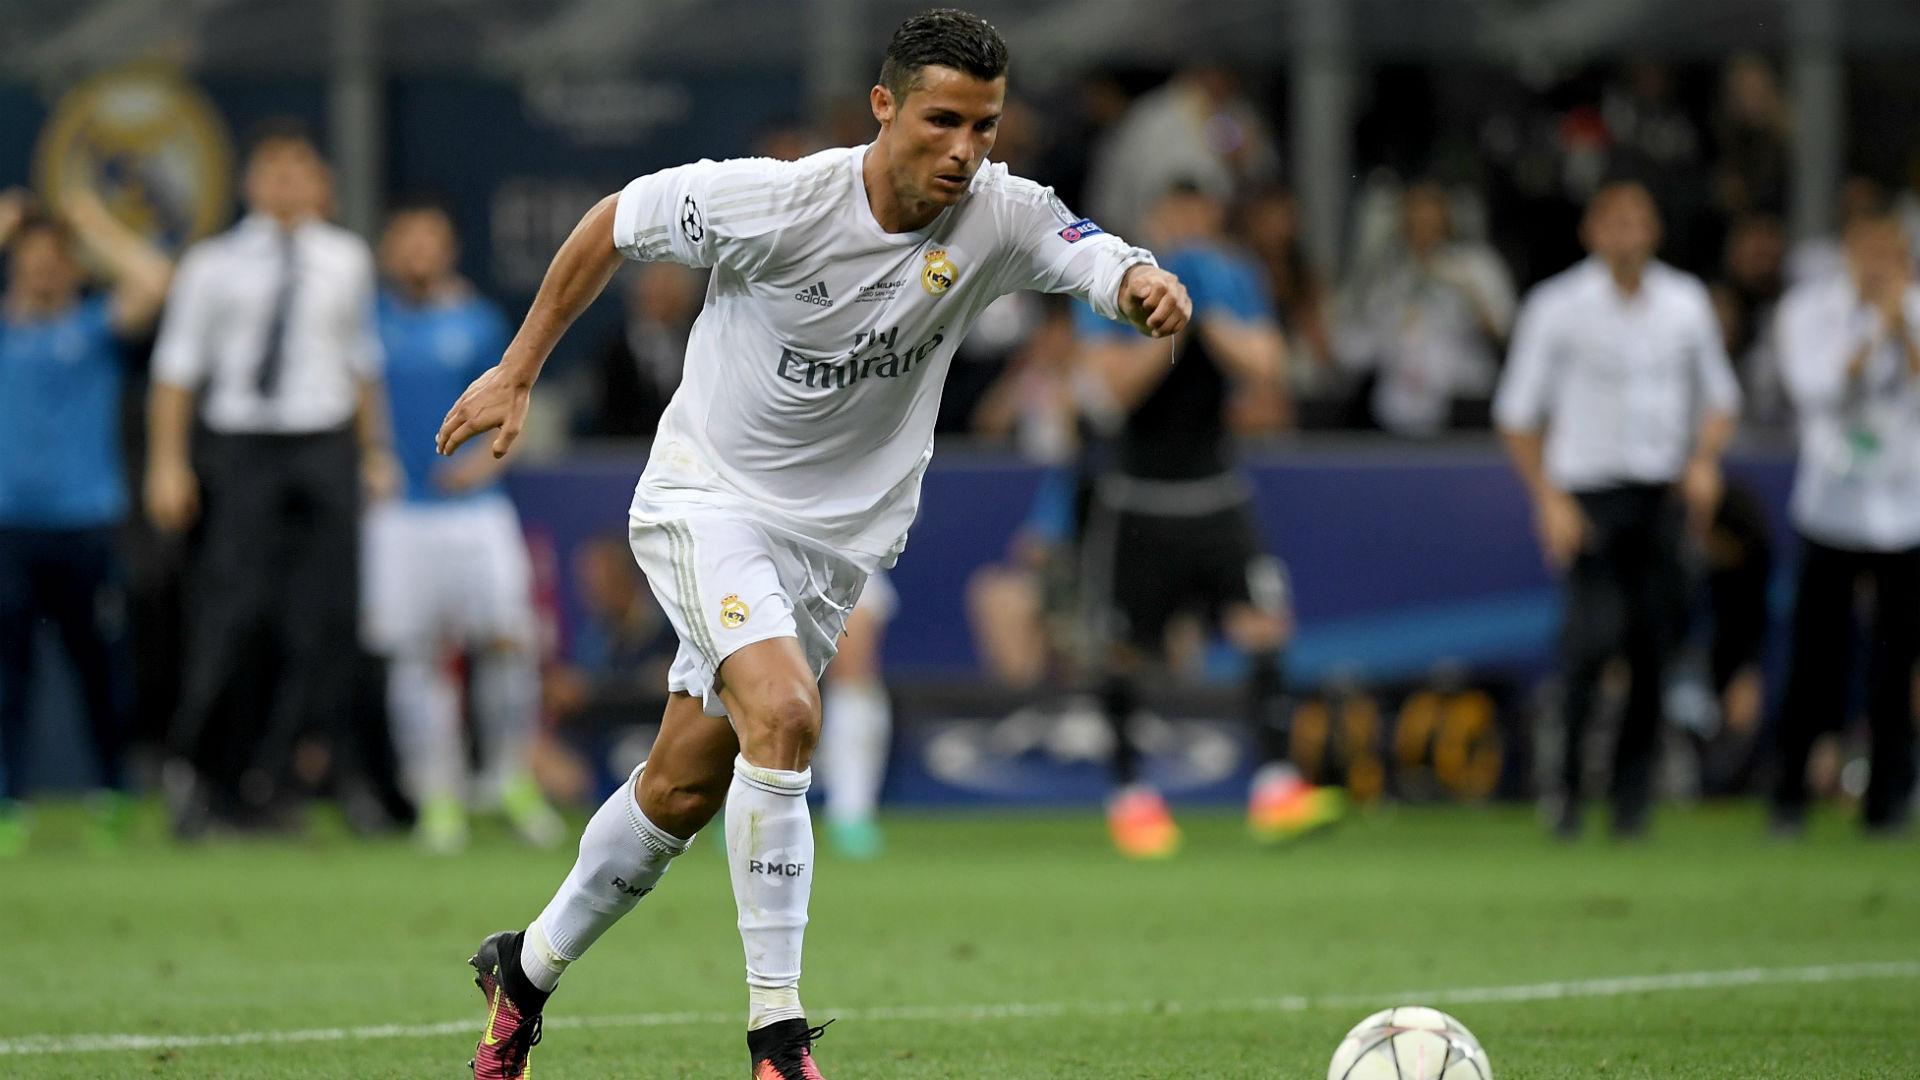 Cristiano Ronaldo s free kick record penalty record & goalscoring